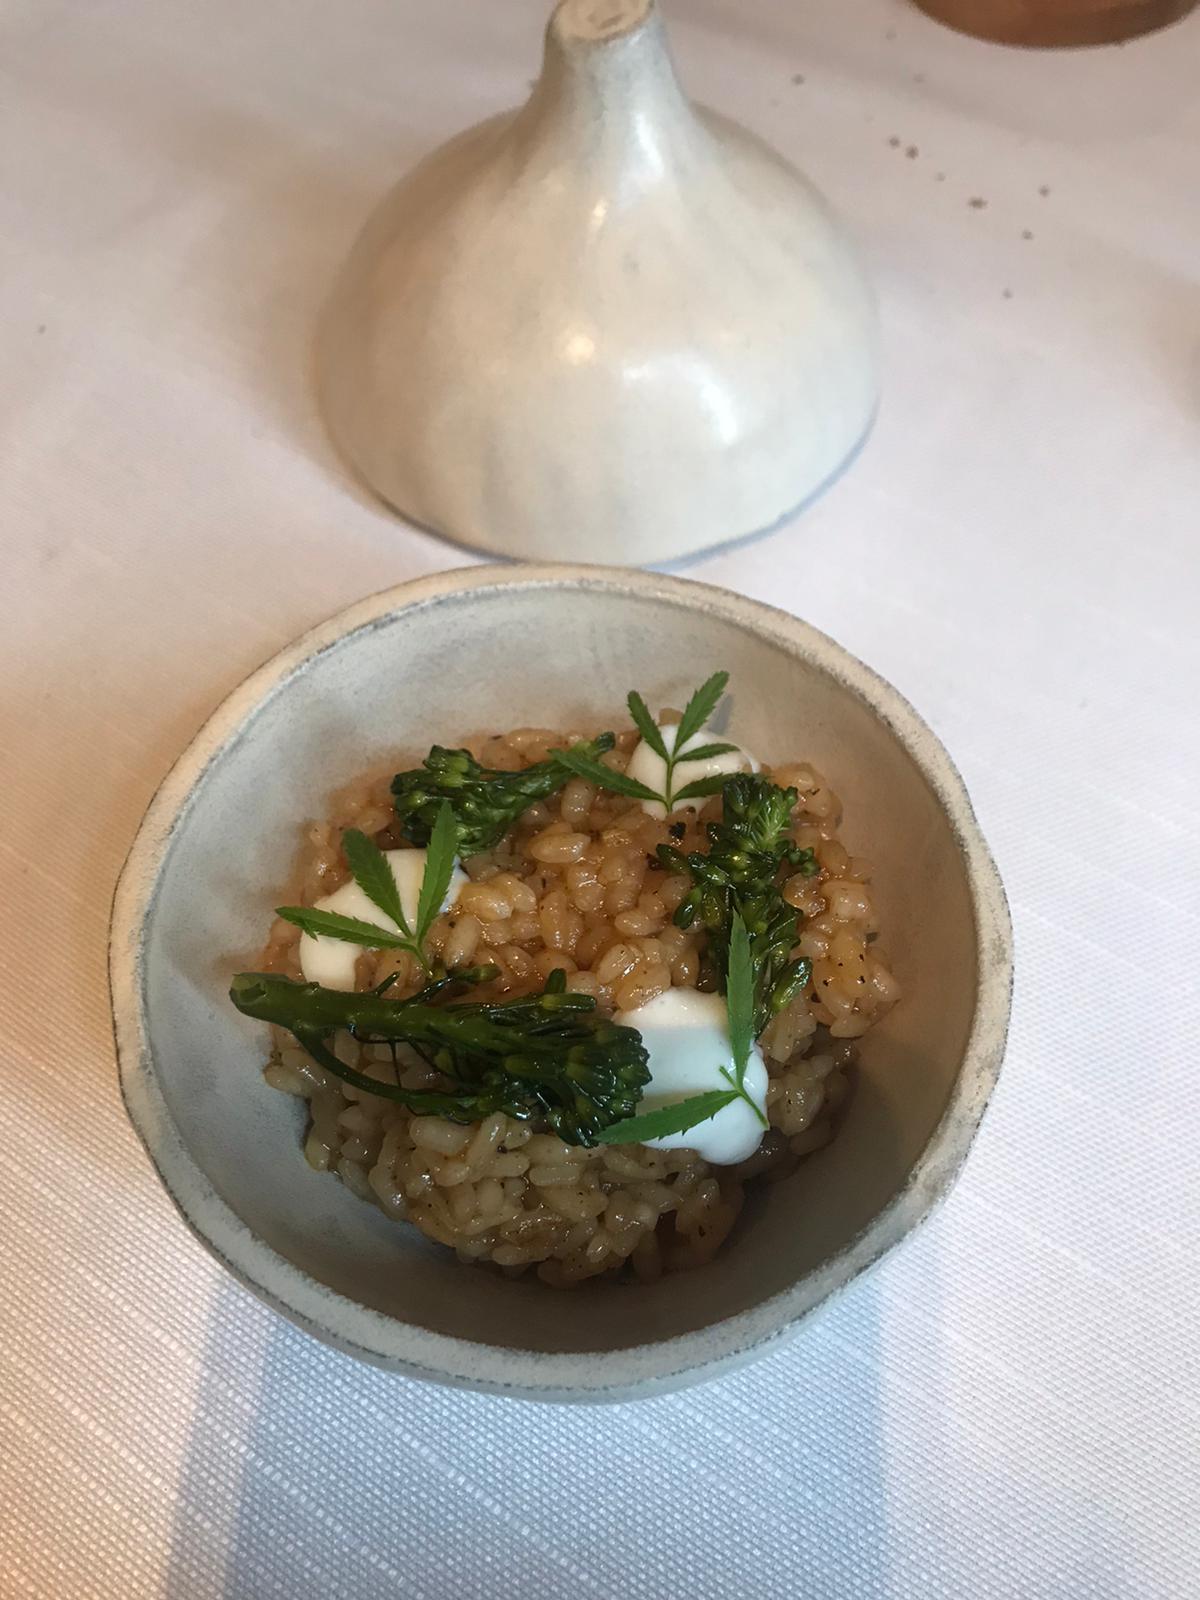 Reseña Gastronómica: Restaurante MU-Na de Ponferrada 7